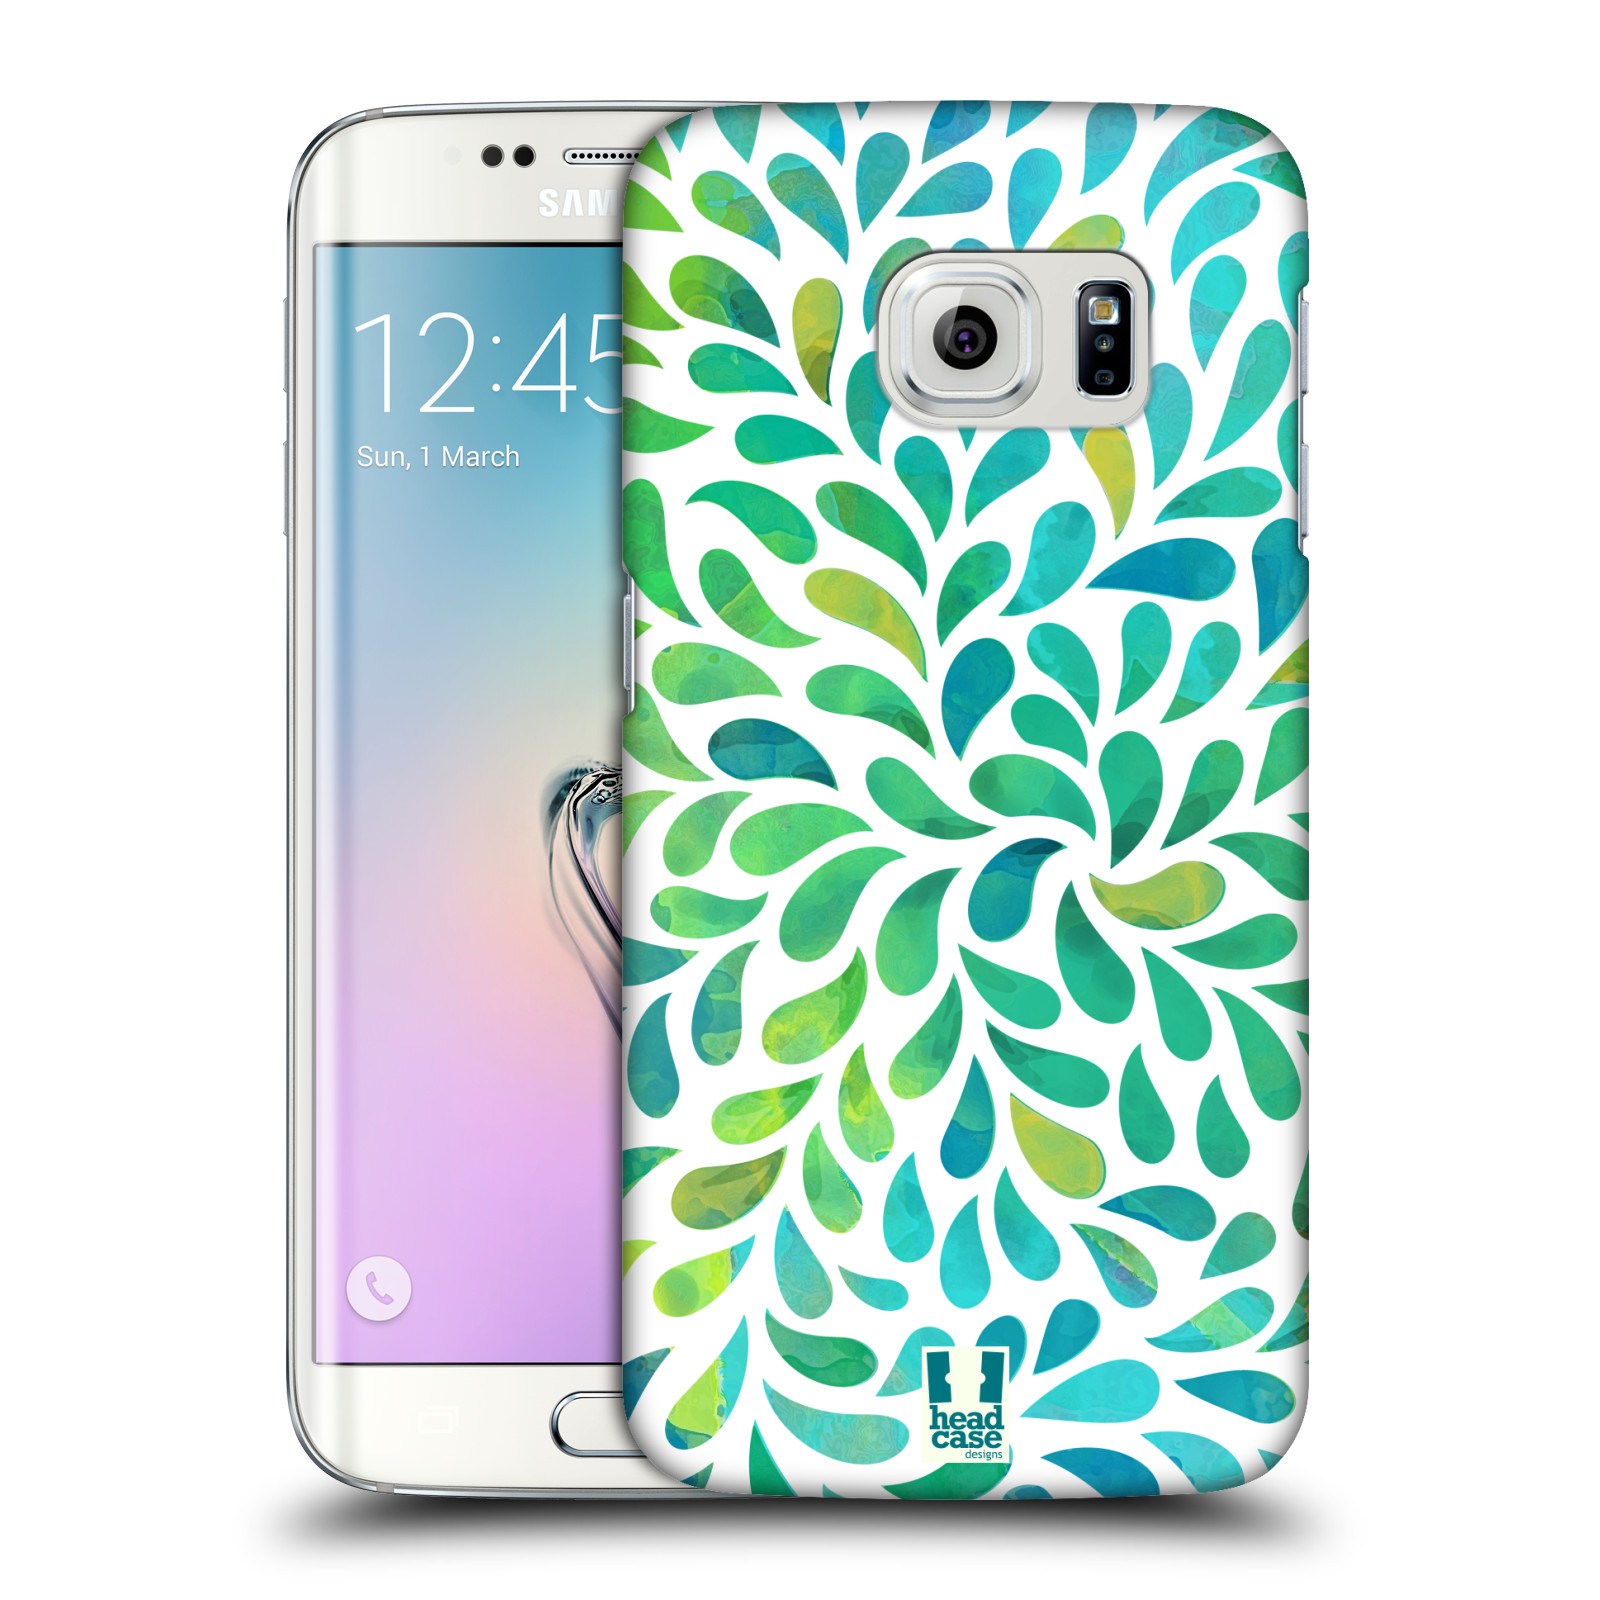 Plastové pouzdro na mobil Samsung Galaxy S6 Edge HEAD CASE Droplet Wave Kapičky (Kryt či obal na mobilní telefon Samsung Galaxy S6 Edge SM-G925F)